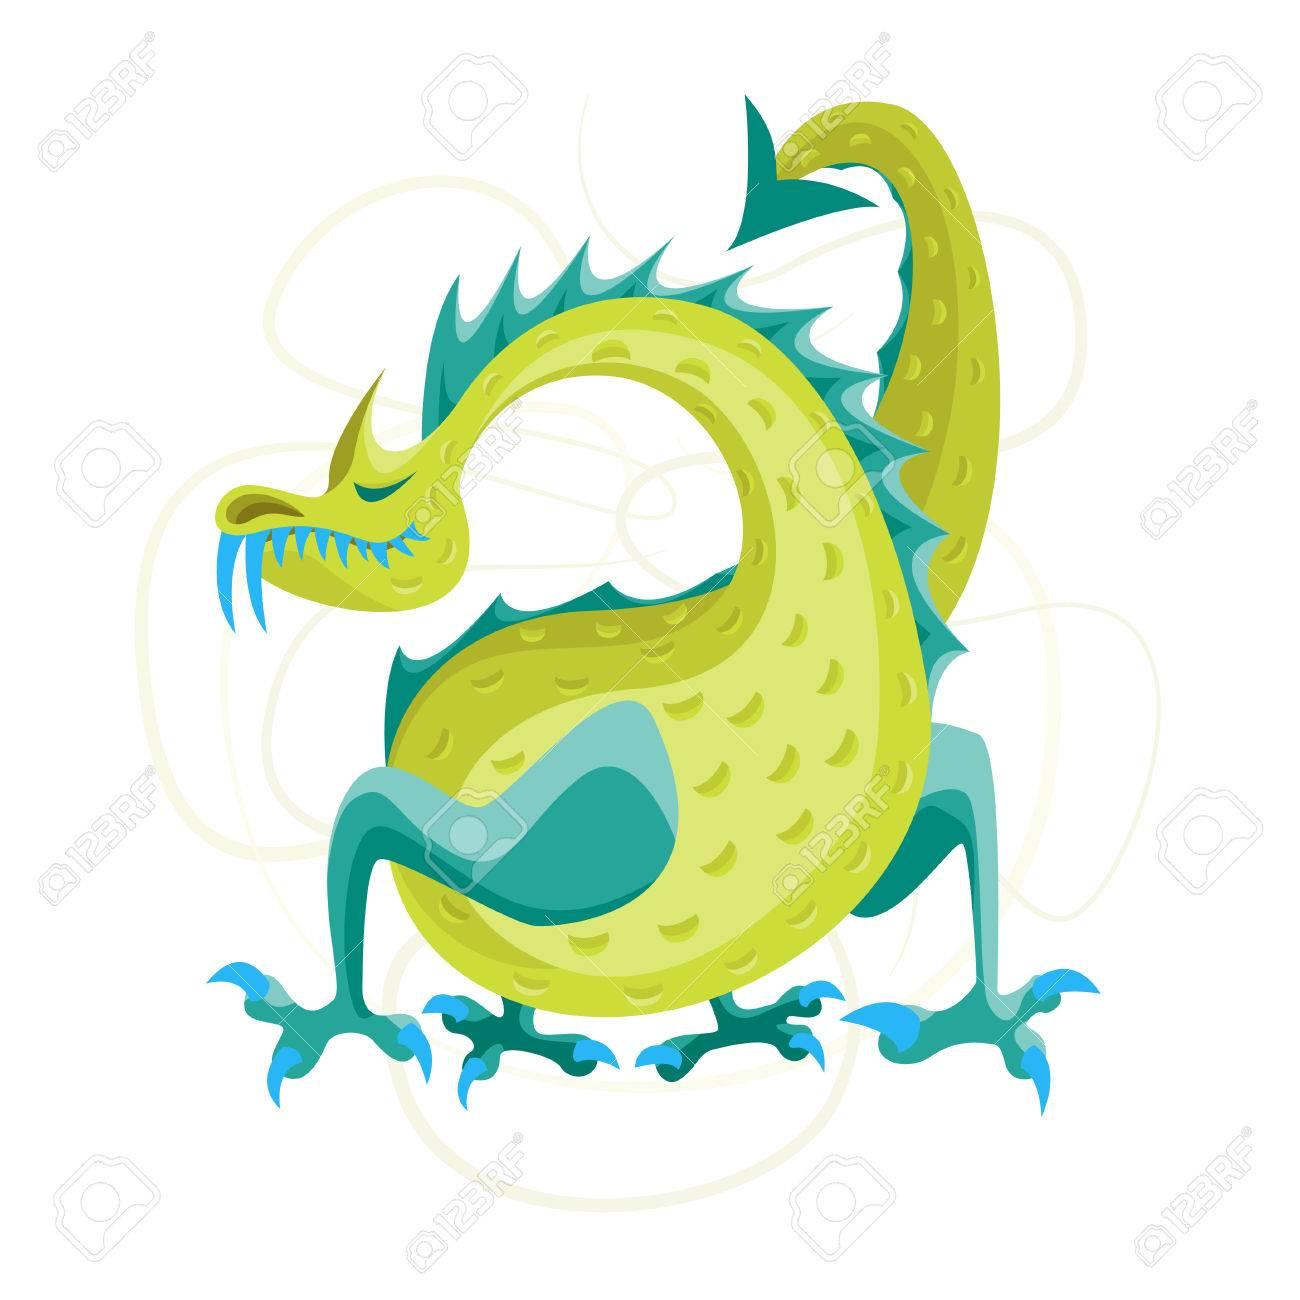 cartoon green fantasy animal dragon cute magic air or water